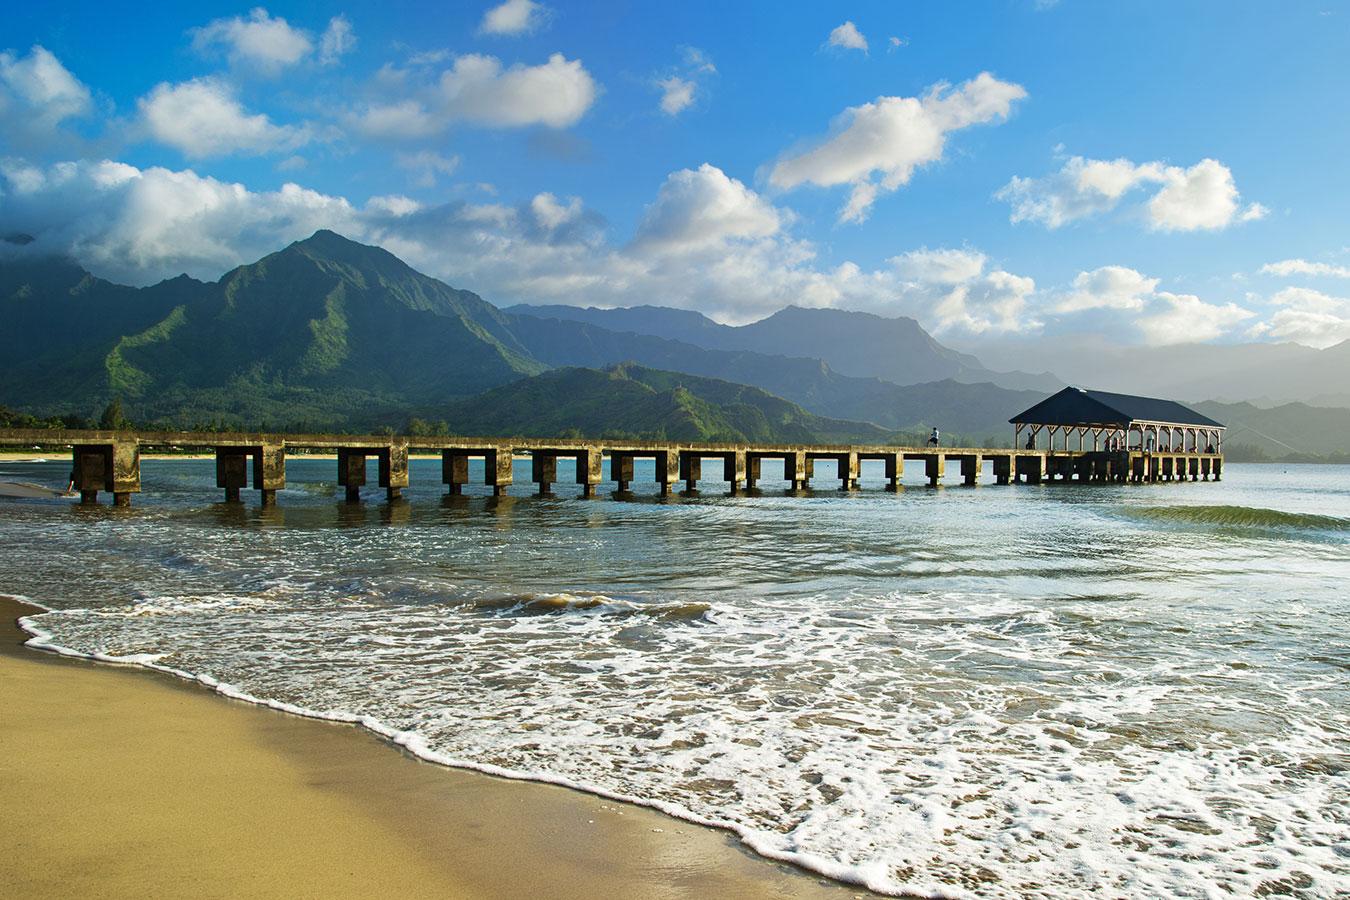 Hanalei Bay, Hawaii - Travel & Tourism Marketing